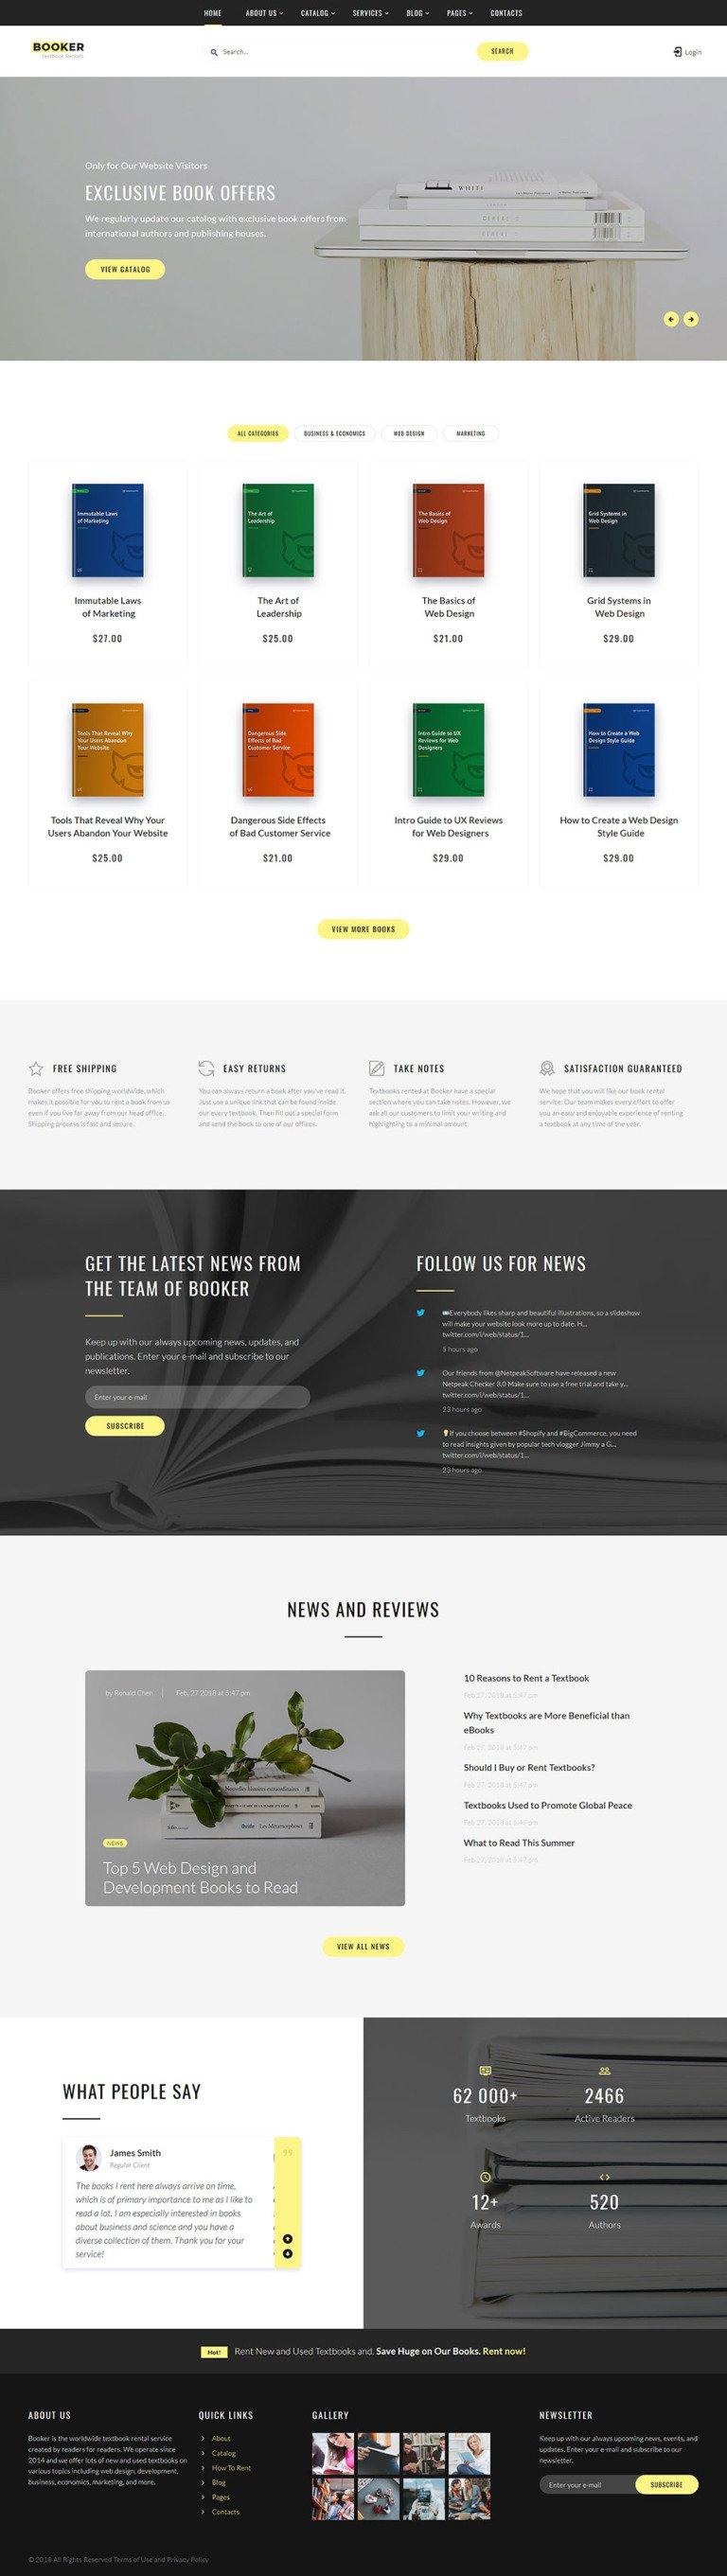 Books Responsive Website Template New Screenshots BIG